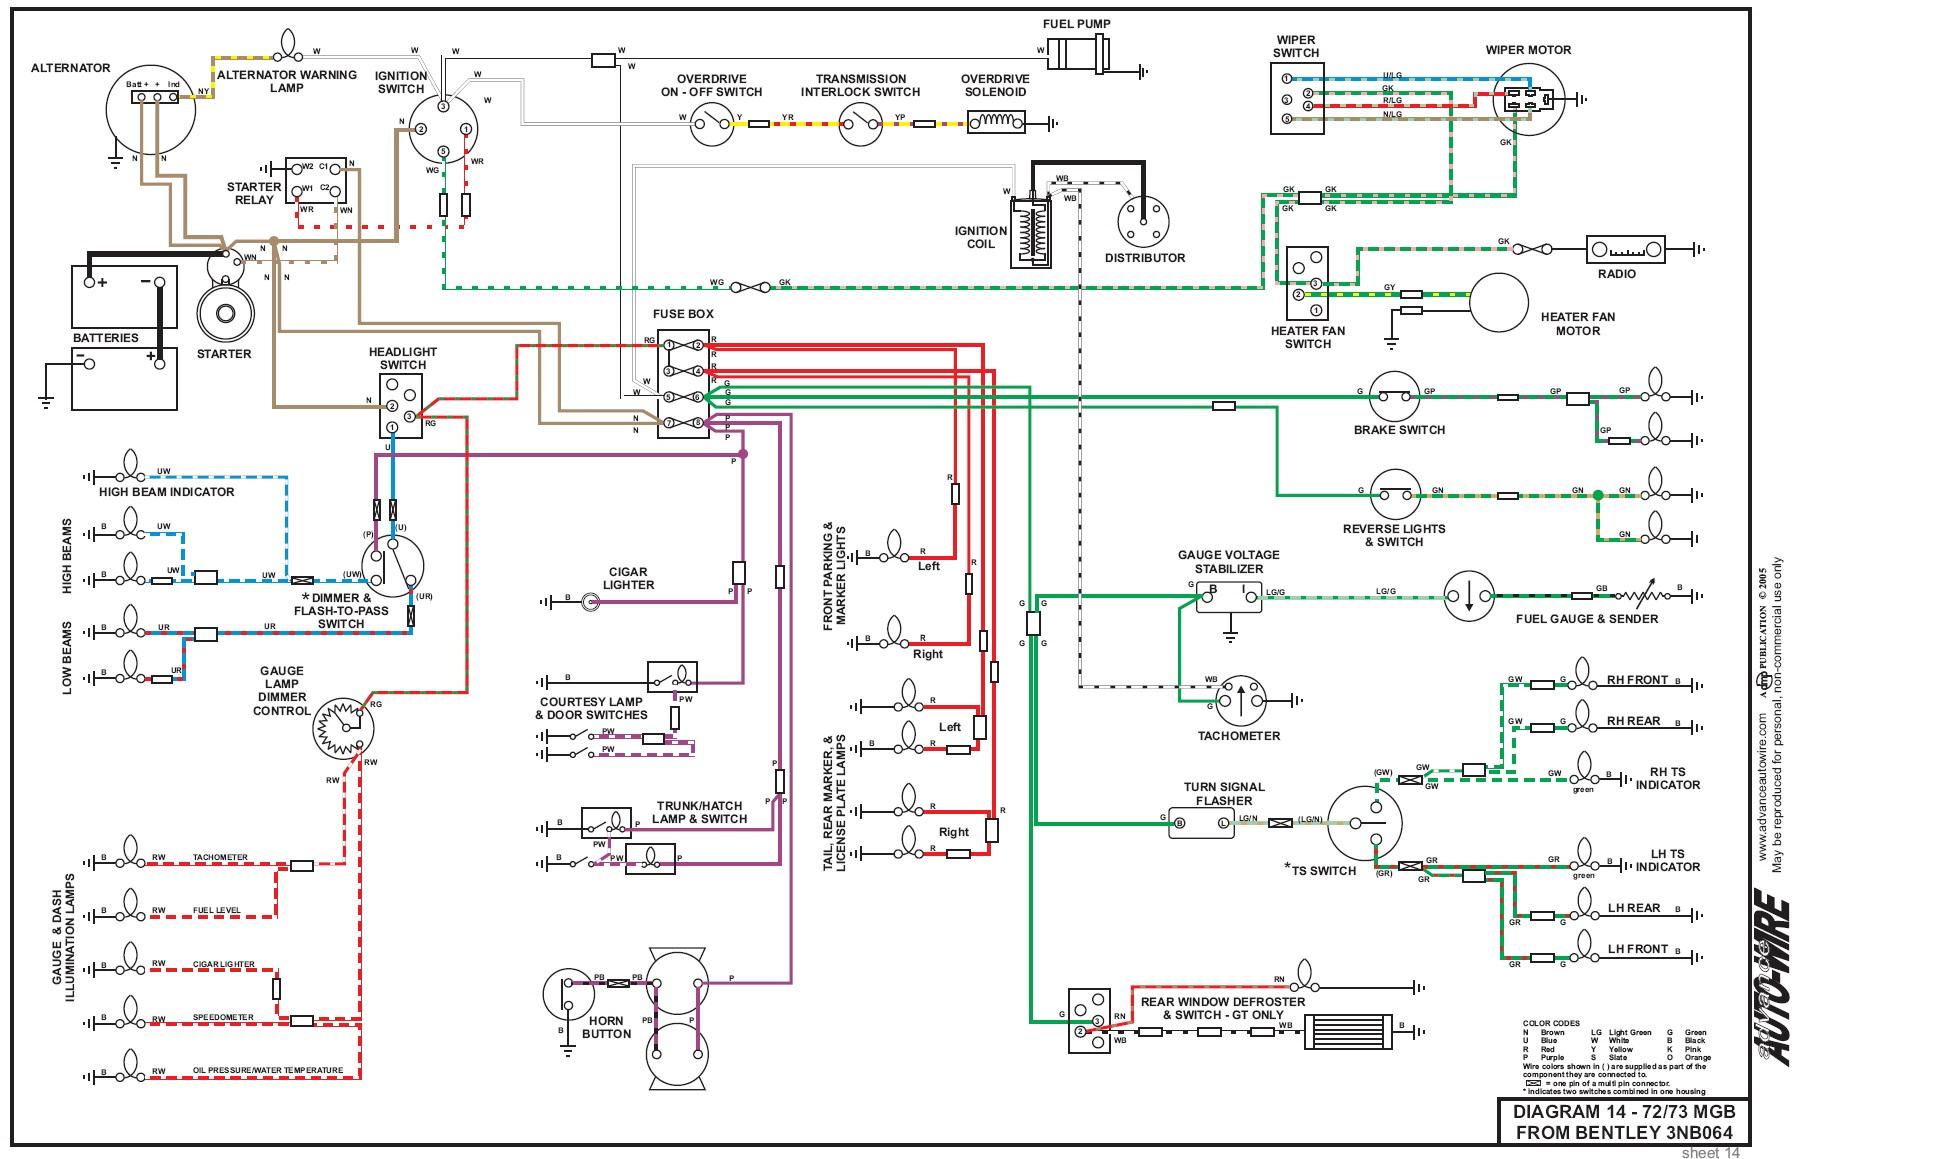 mgb fuse diagram search wiring diagrams 1969 Mustang Fuse Box Diagram